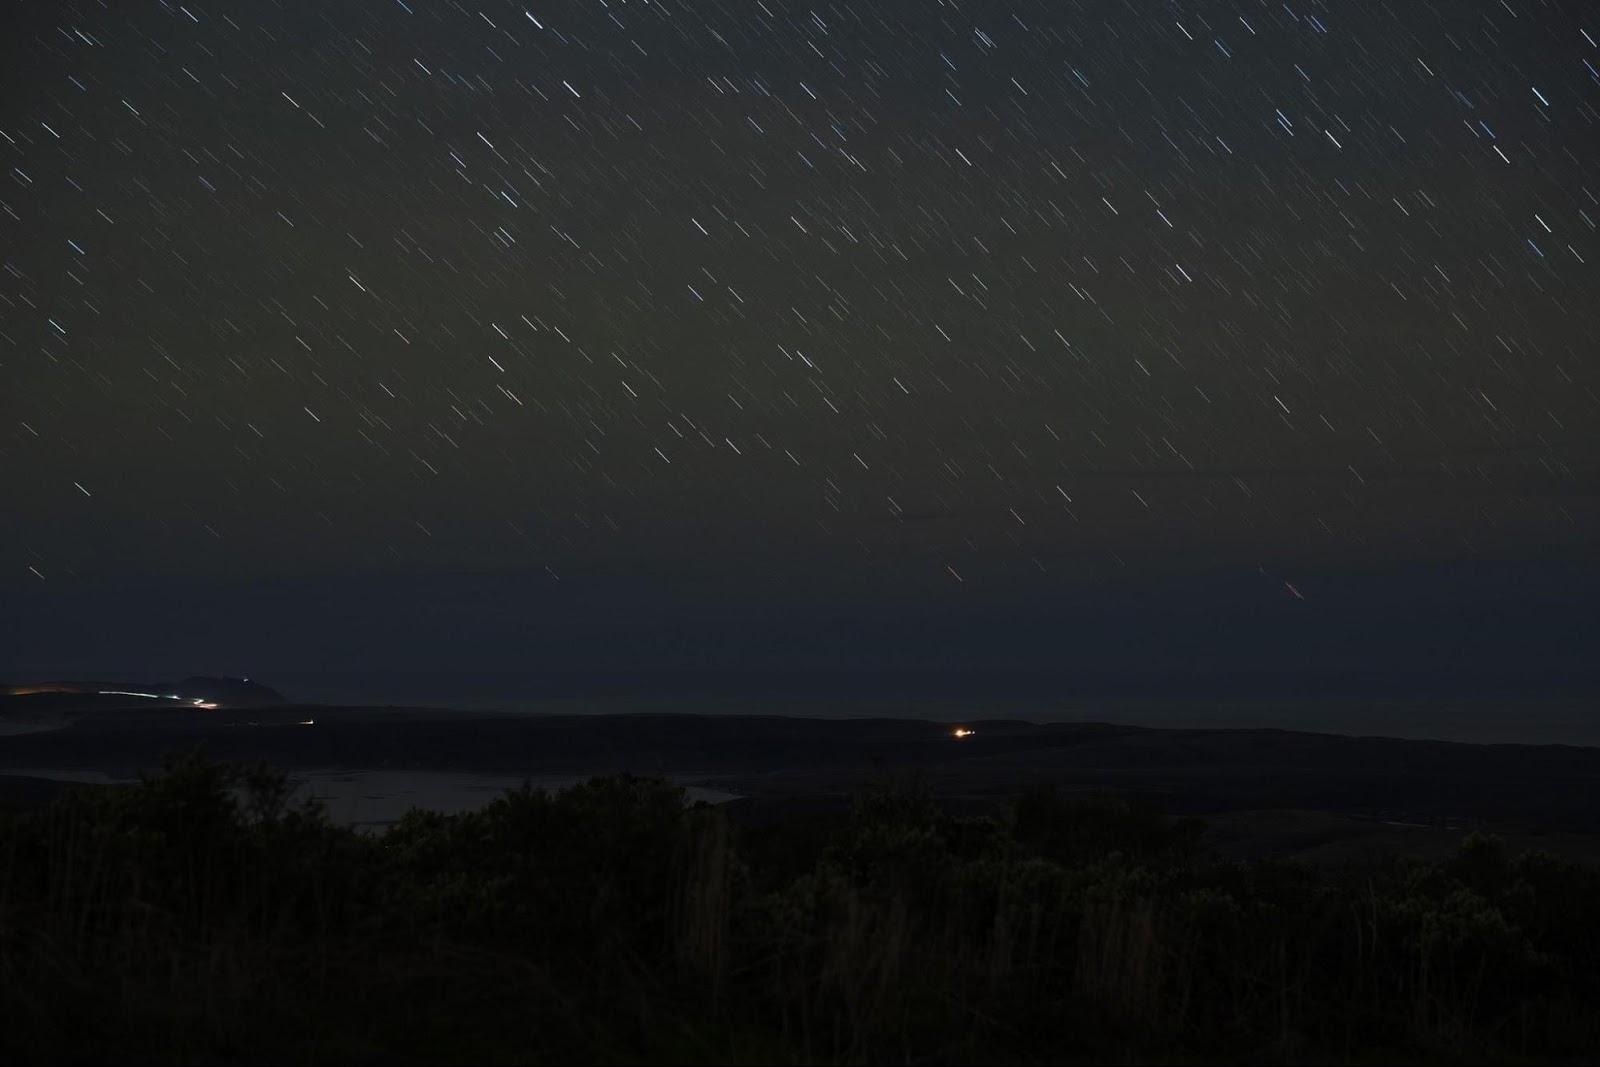 fotenie hviezd